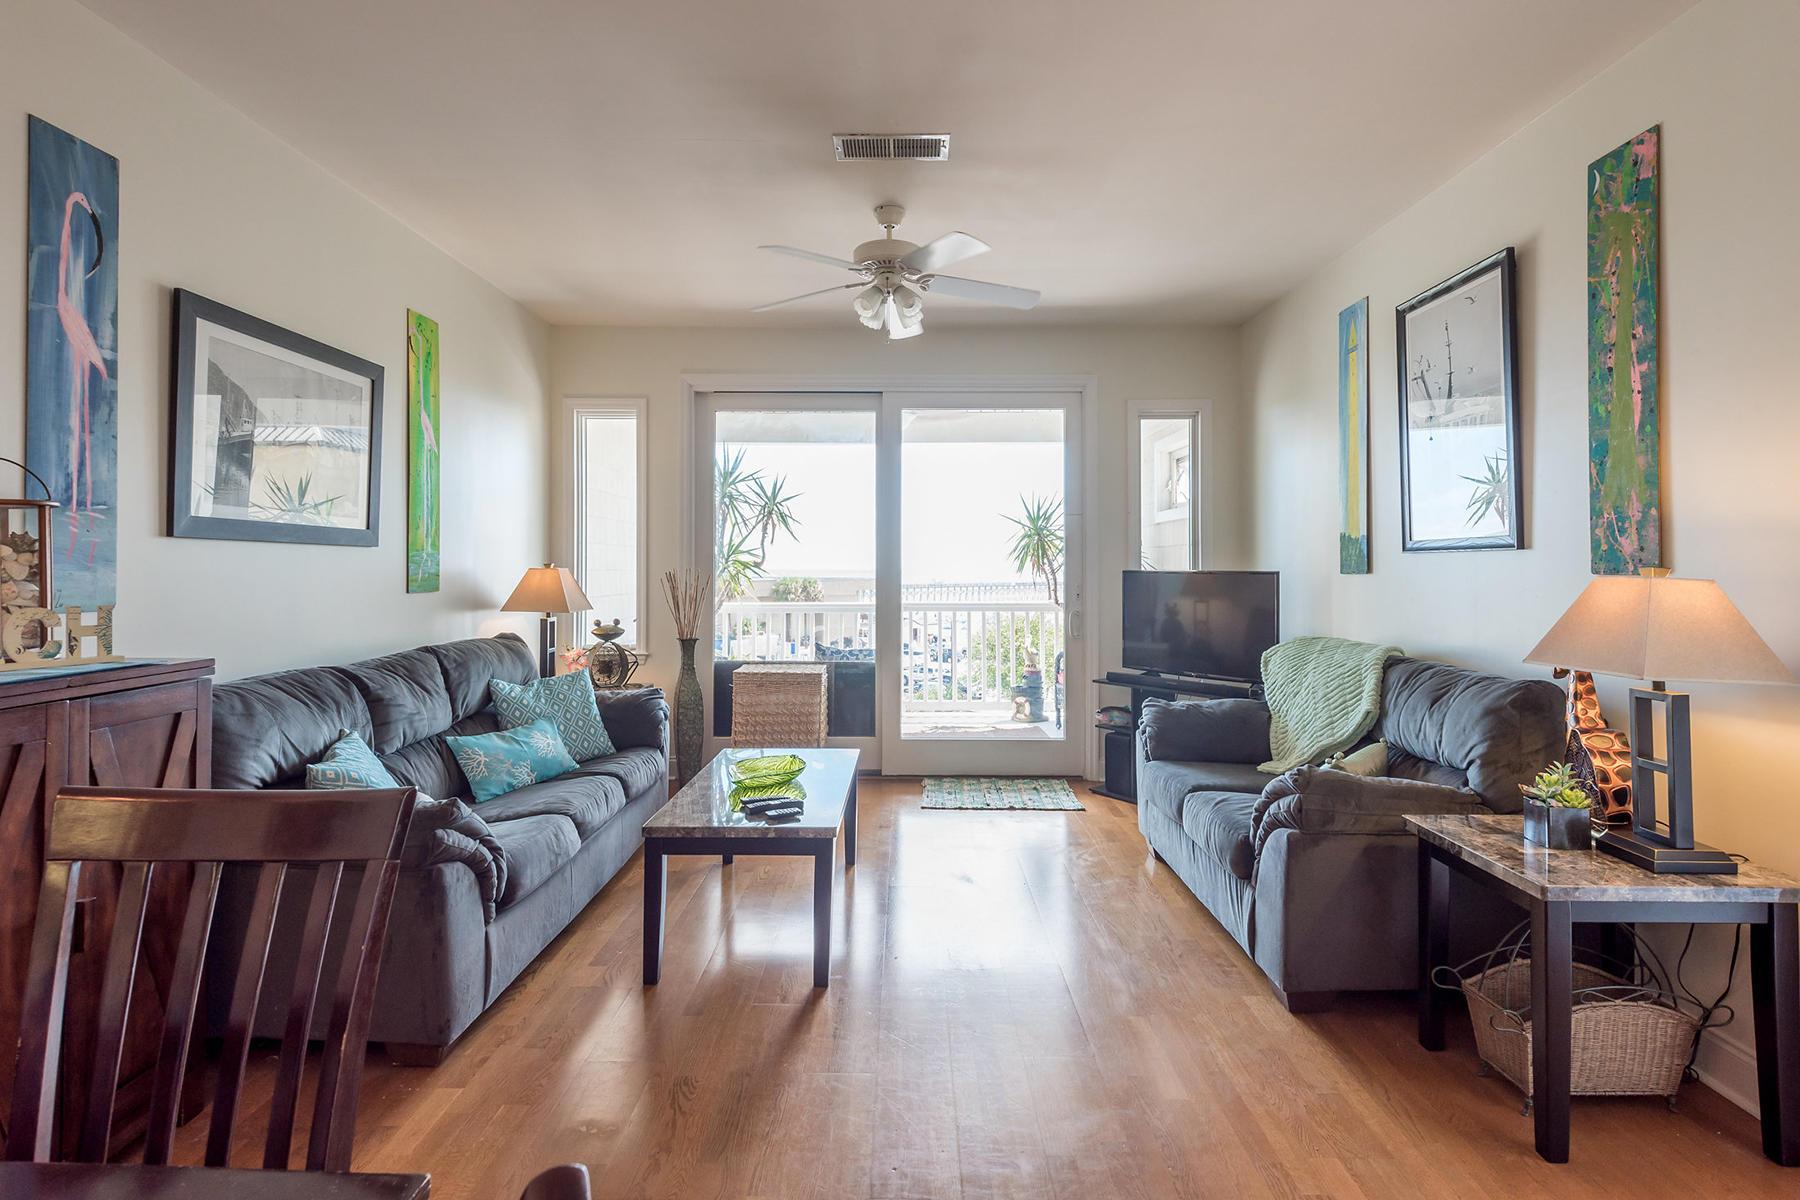 Pier Pointe Villas Homes For Sale - 114 Ashley, Folly Beach, SC - 28